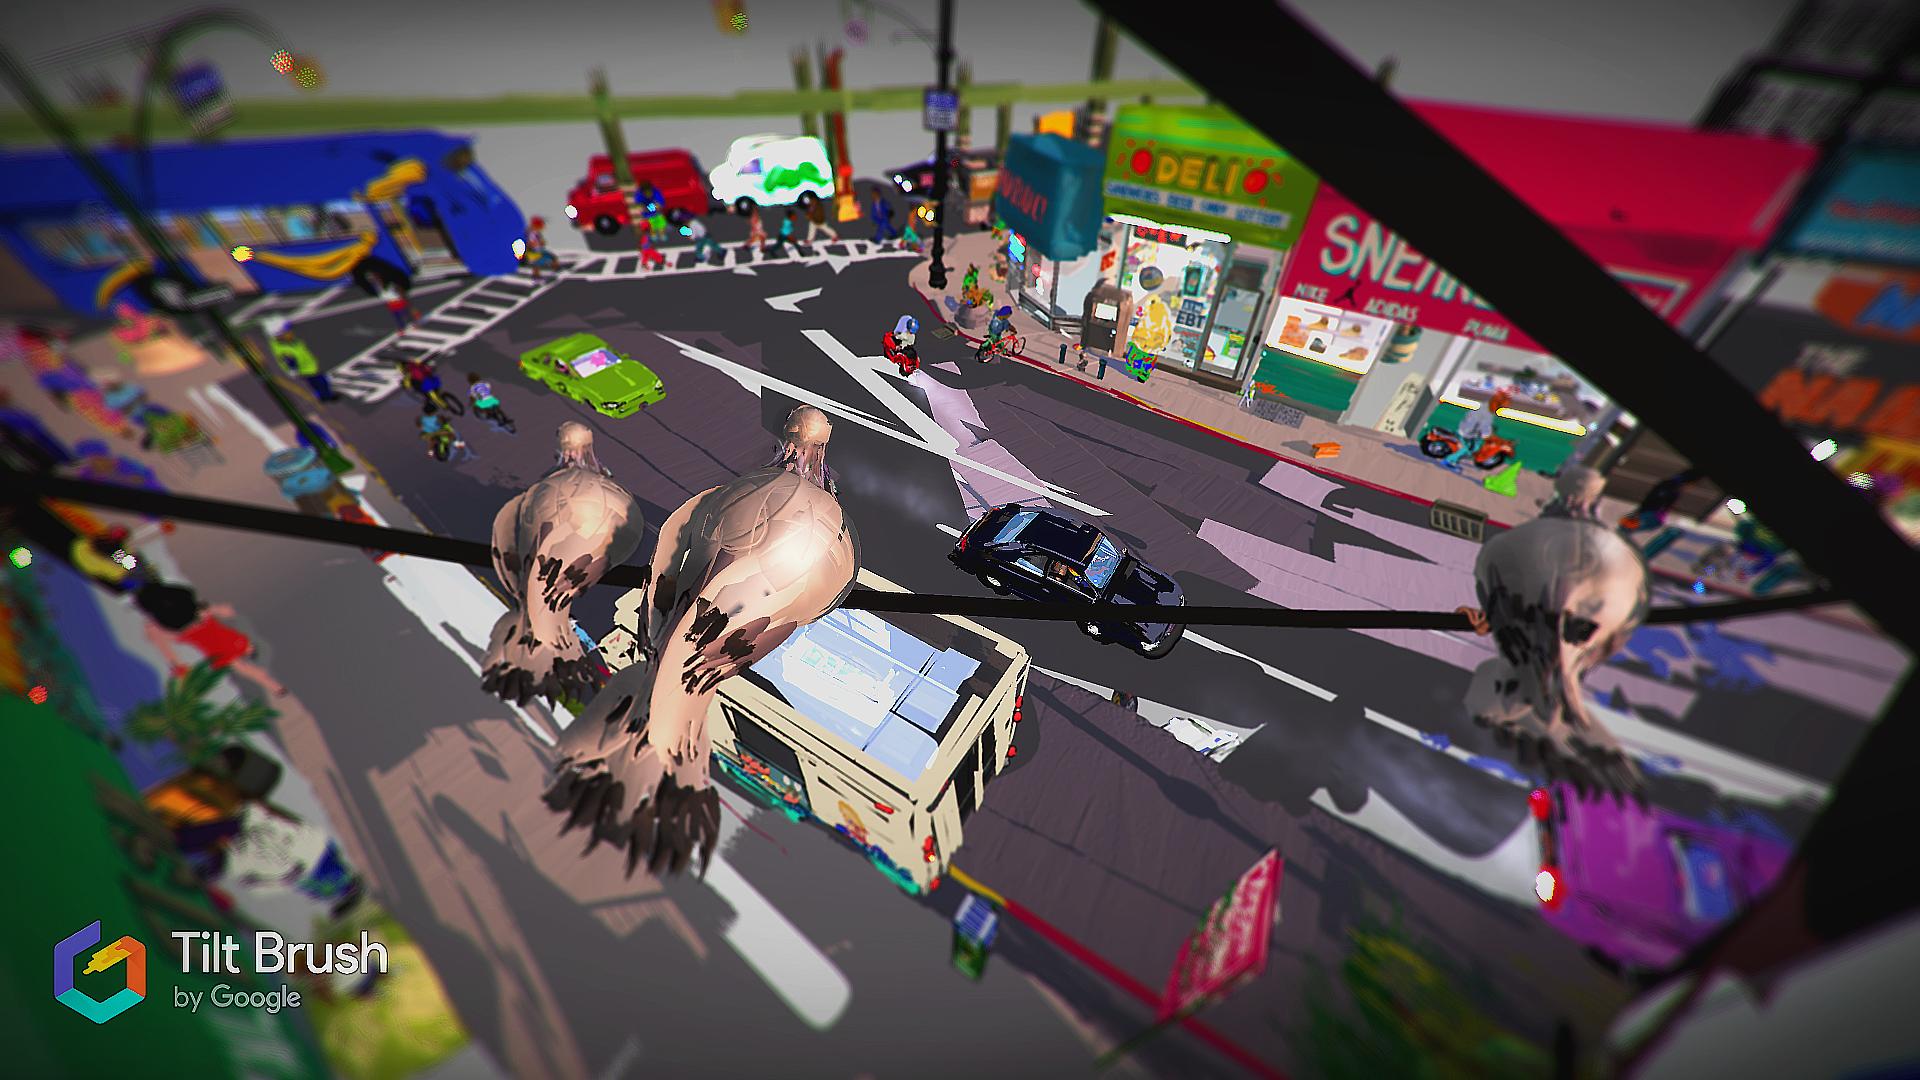 A Bronx Virtual Reality Painting